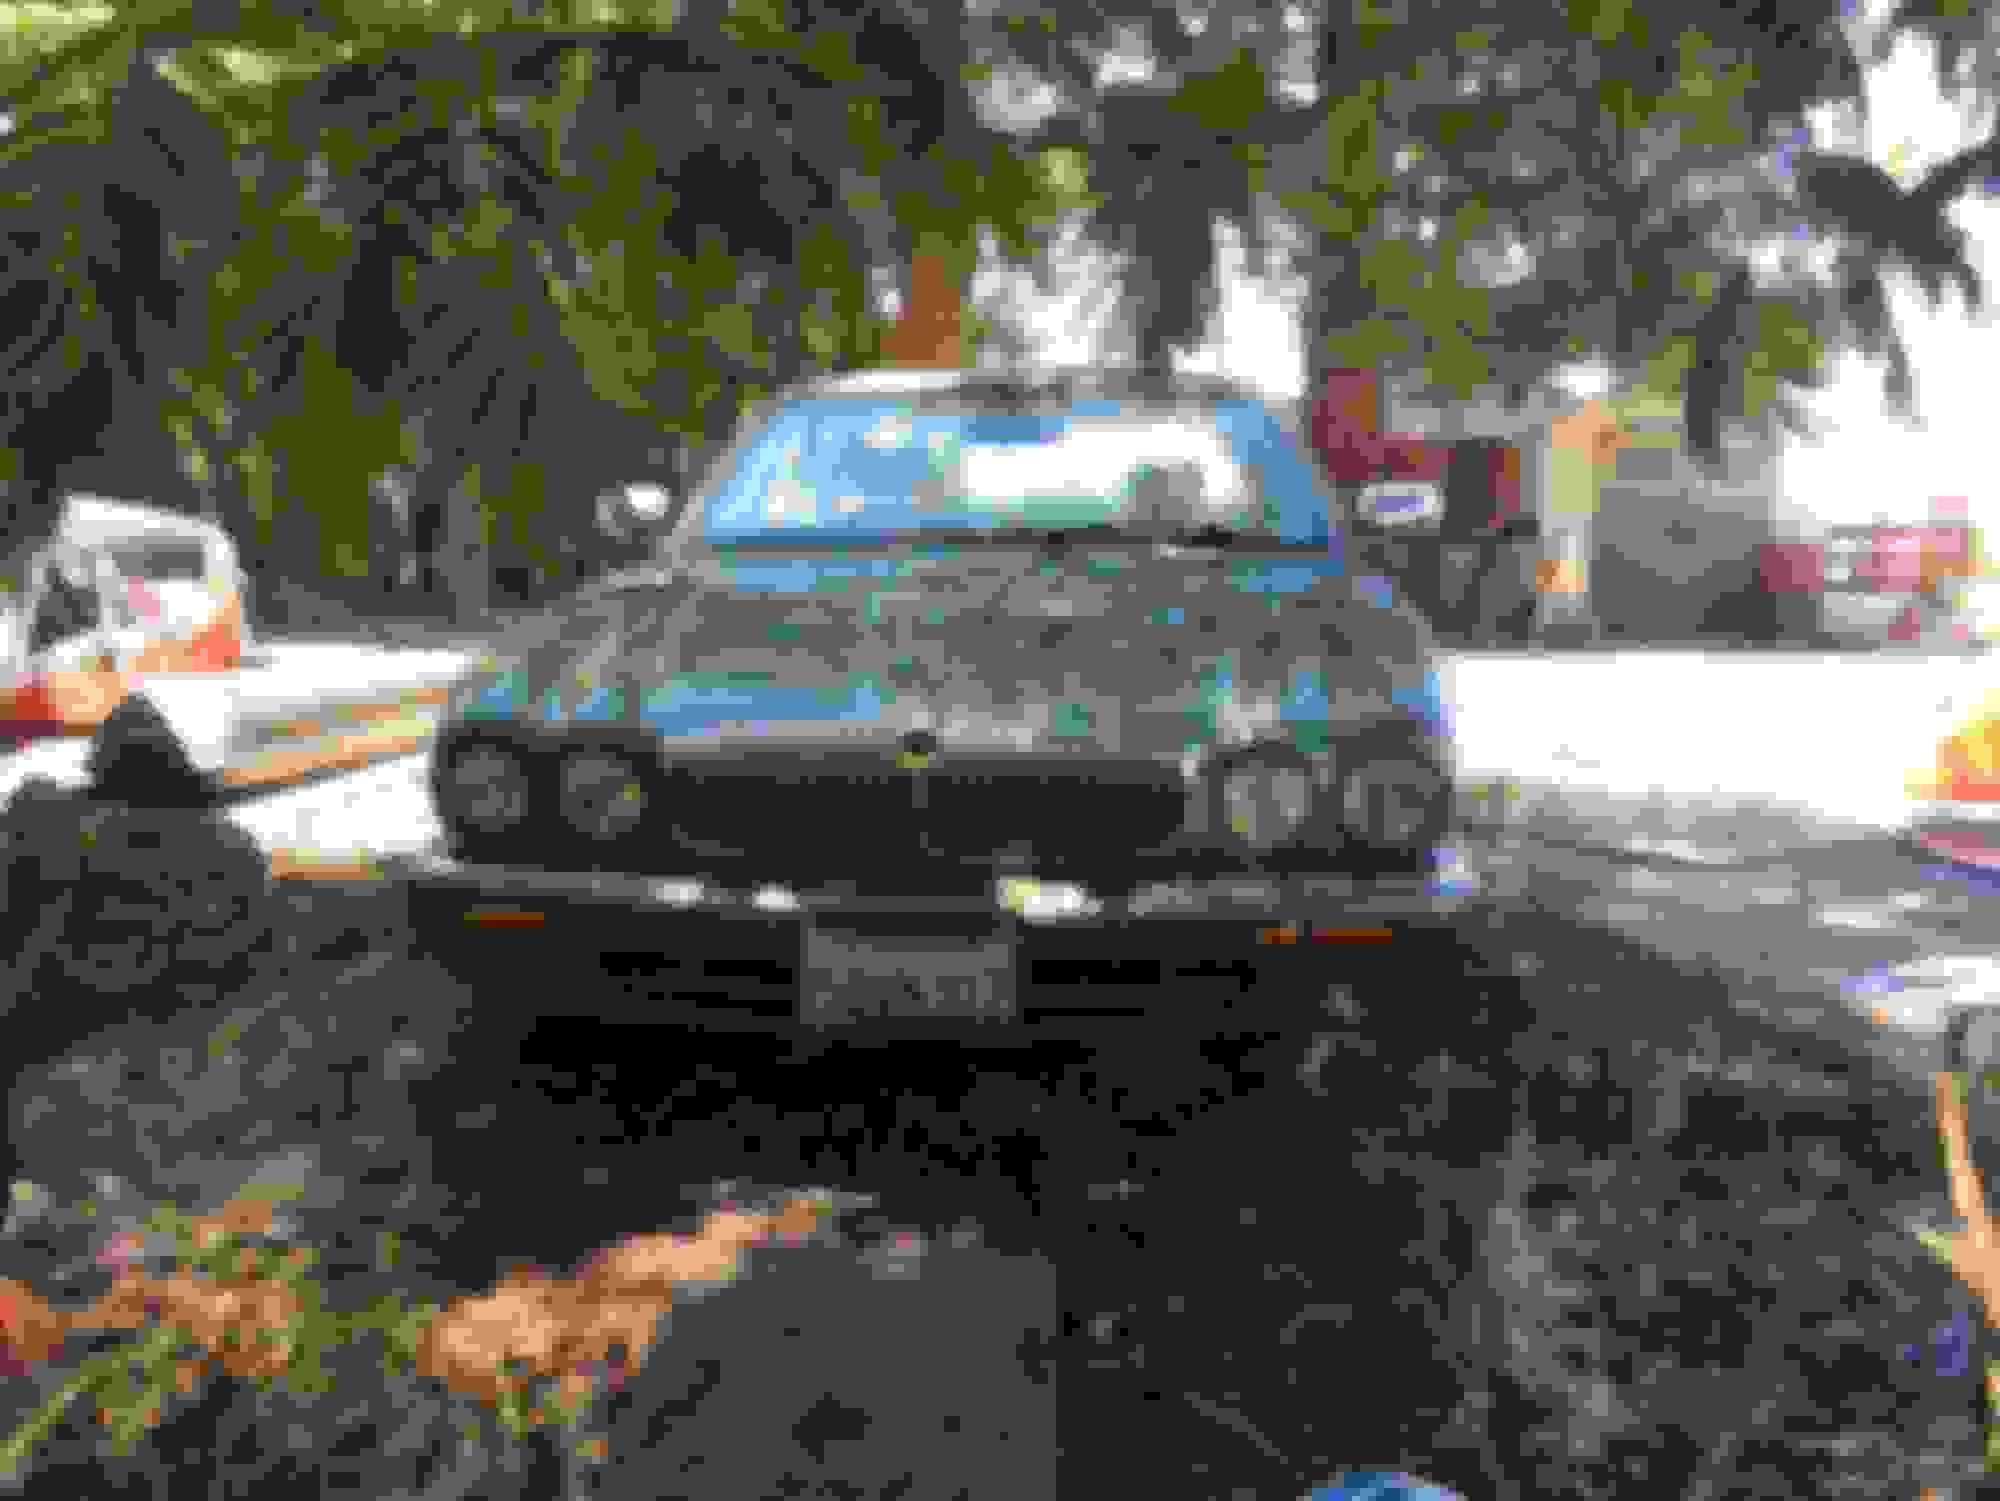 99 Jag V8 4.0 wiring harness - Jaguar Forums - Jaguar ... Jags Auto Wire Harness on